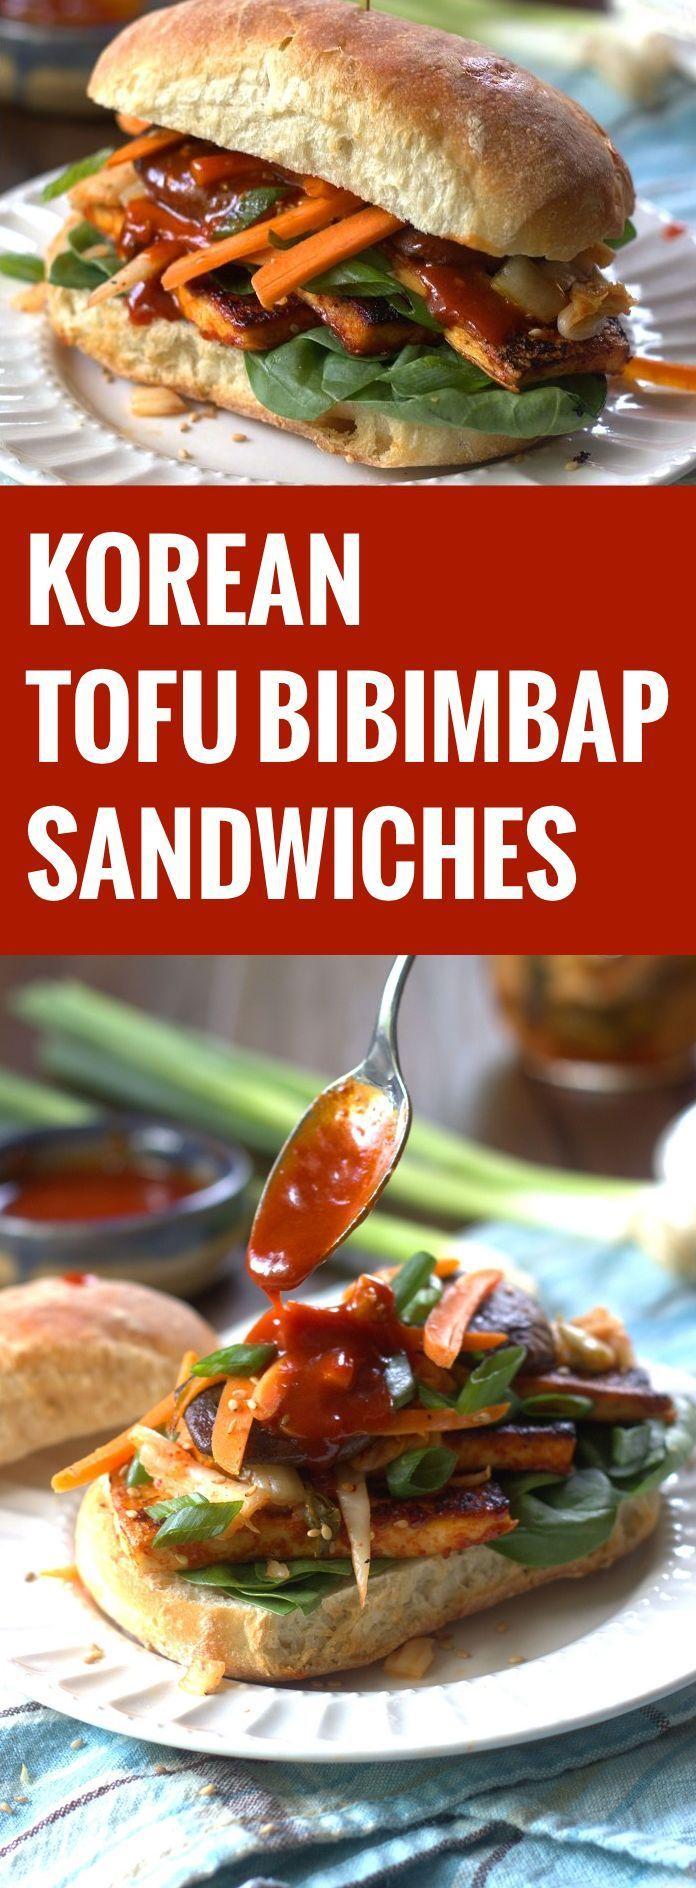 6035 best korean food recipes images on pinterest korean food korean tofu bibimbap sandwiches vegan vegan korean foodkorean food recipesvegan forumfinder Gallery